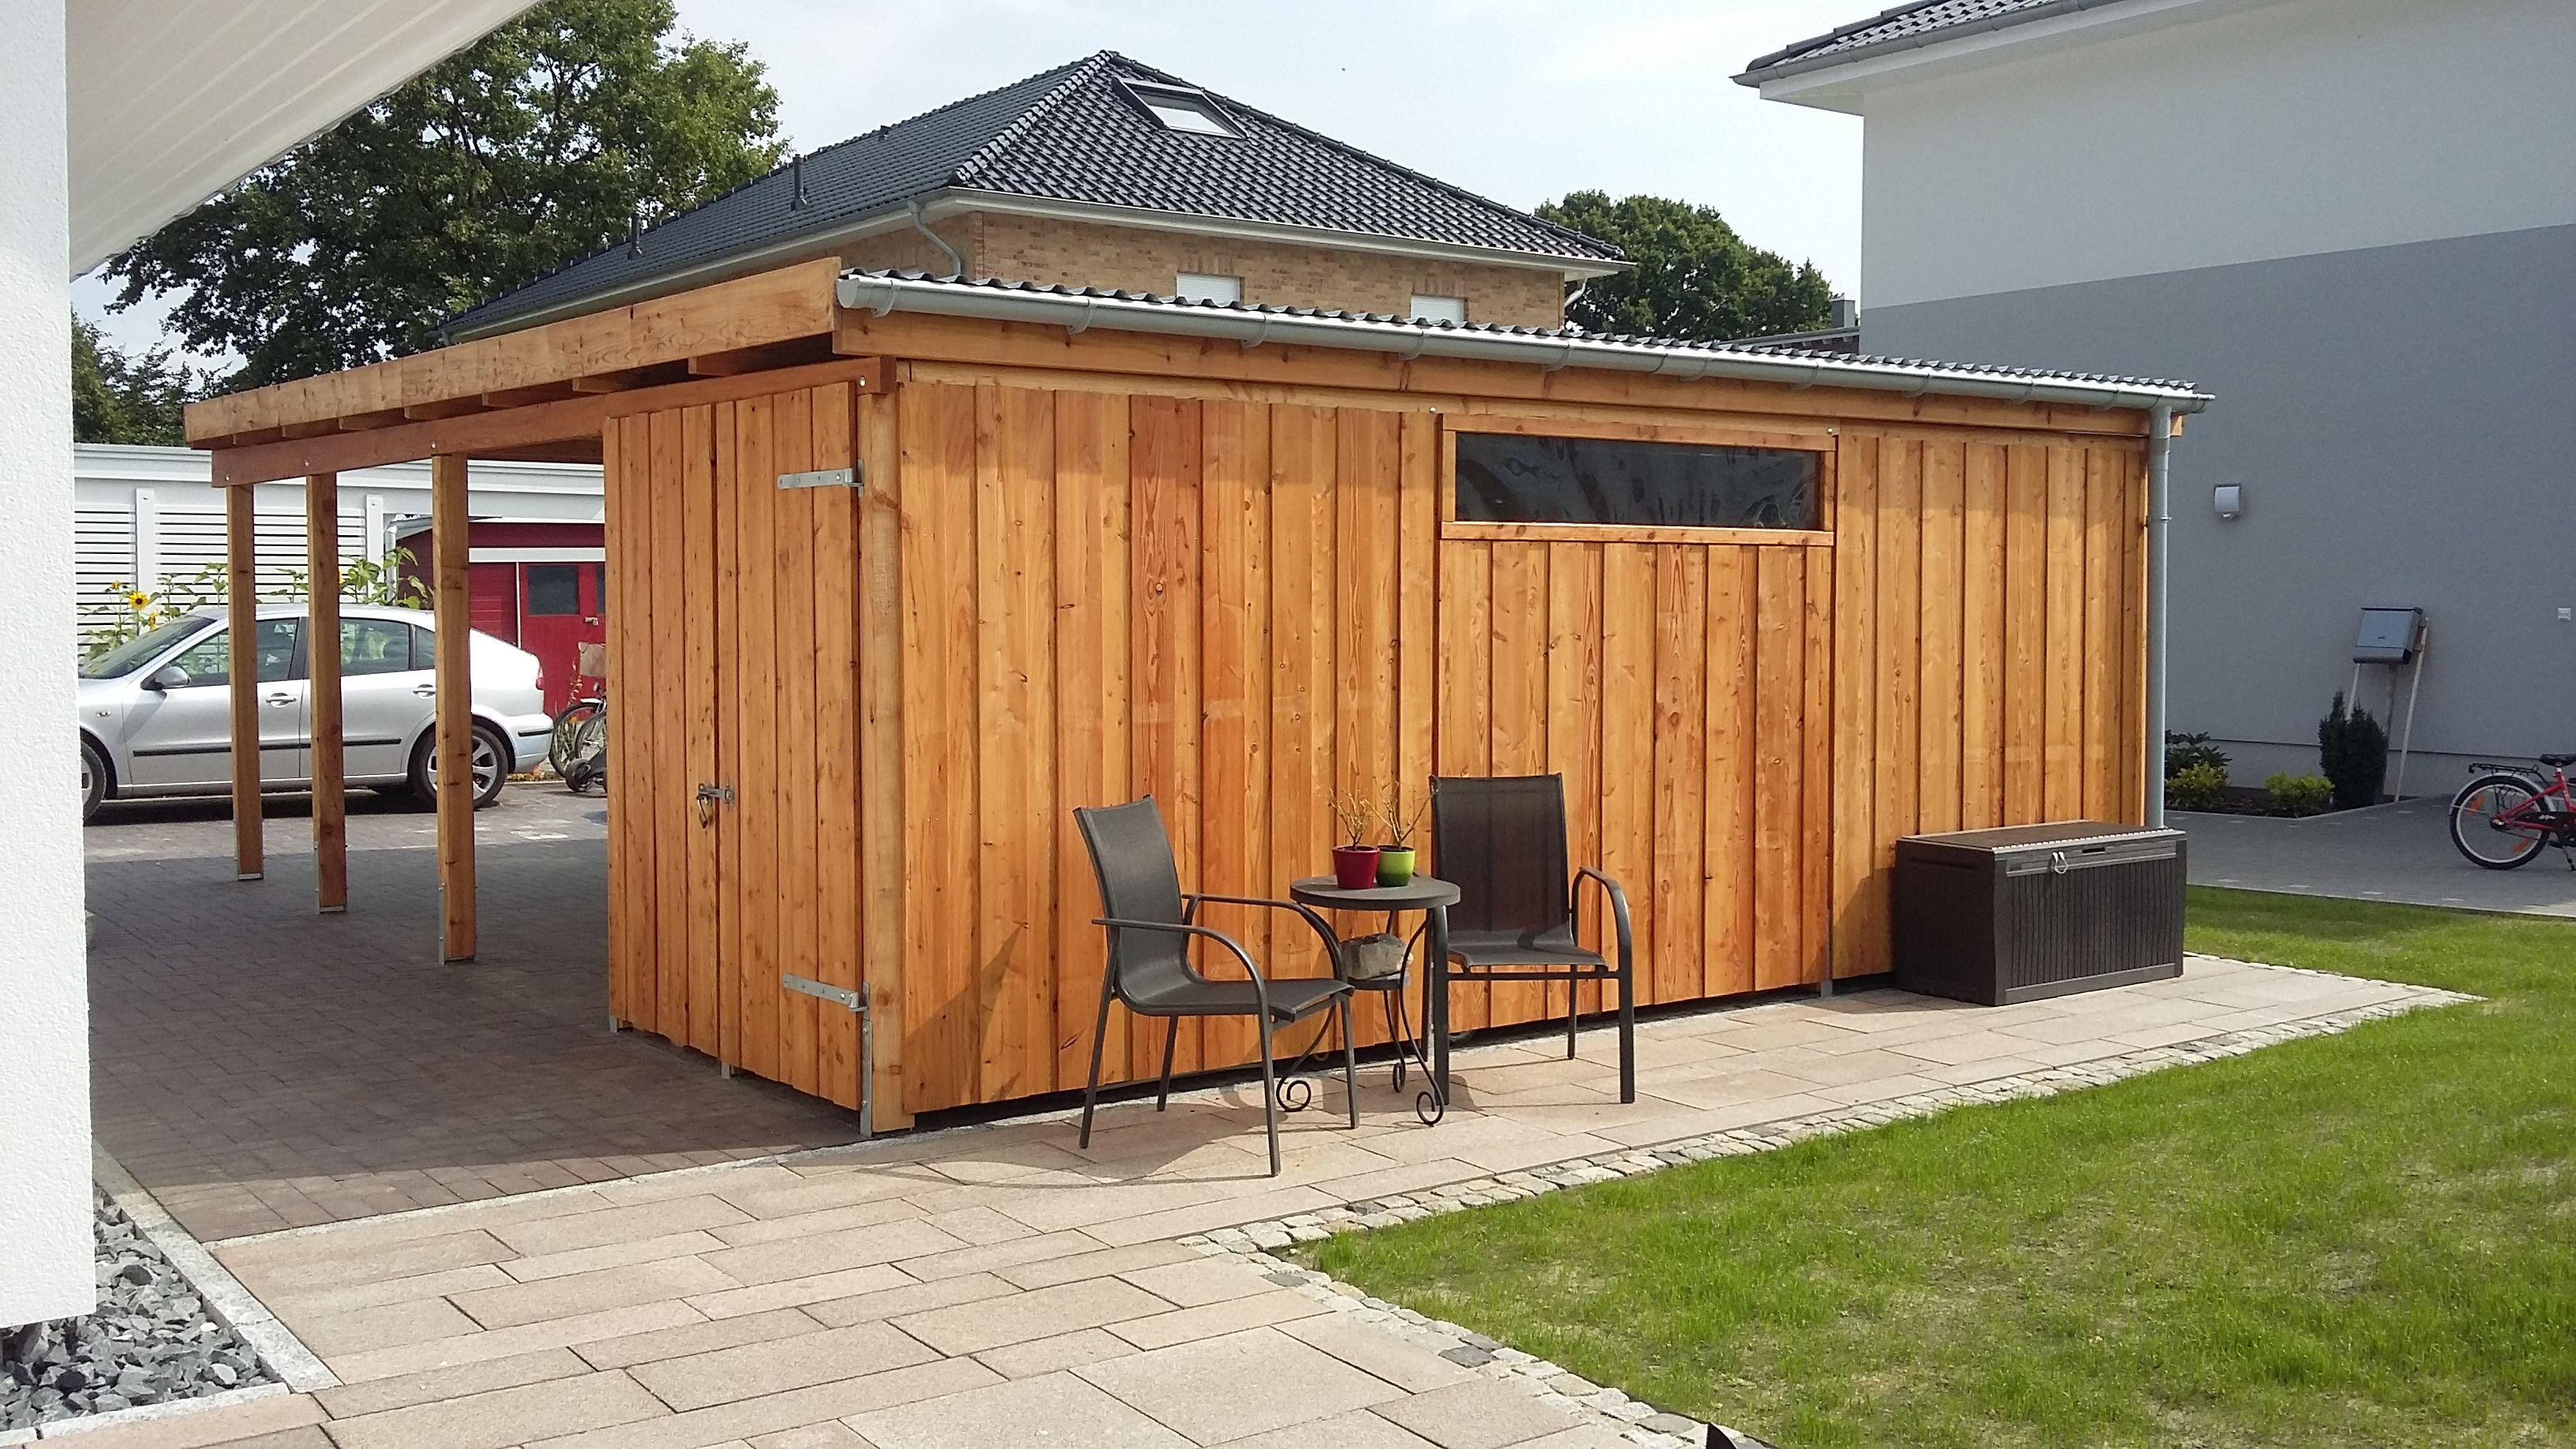 carport in l rche mit abstellraum carport l rche. Black Bedroom Furniture Sets. Home Design Ideas